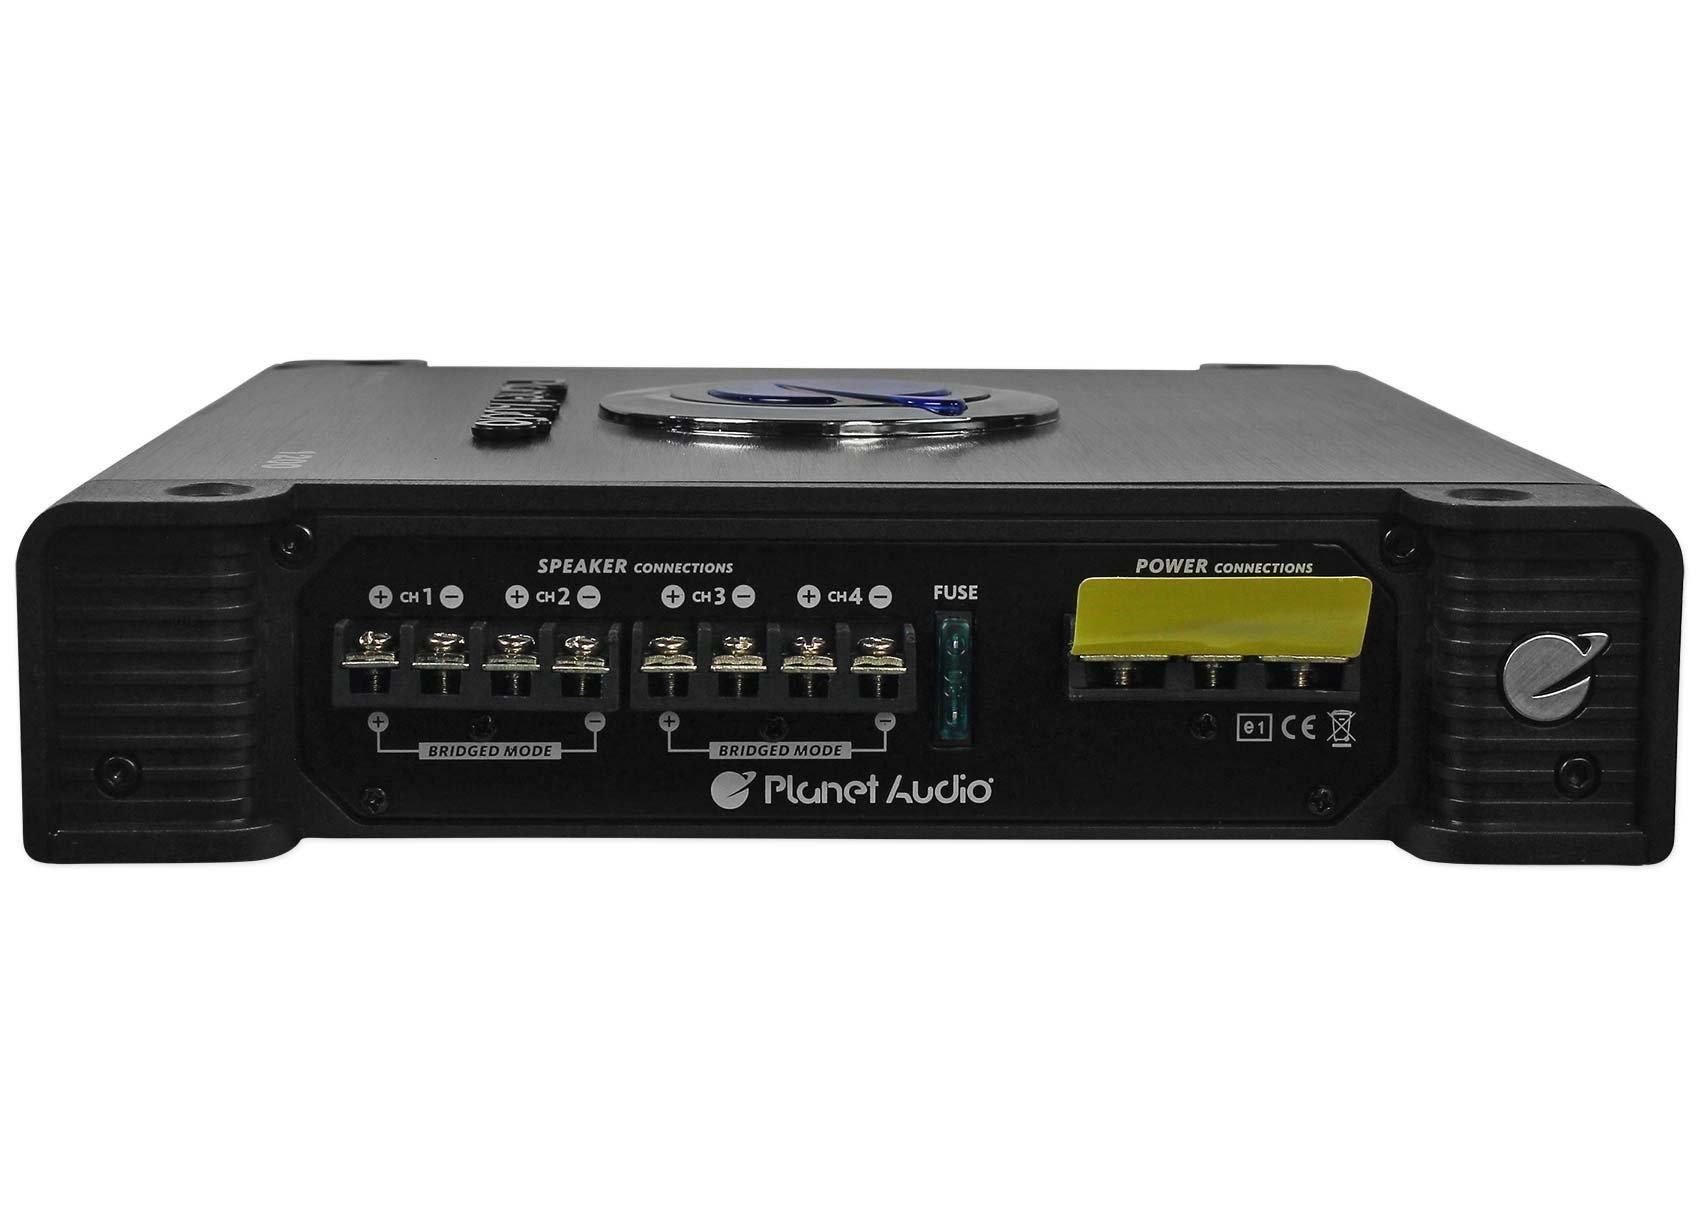 Planet Audio Anarchy AC1200.4 1200 Watt 4 Channel Car Amplifier+Amp Kit by Planet Audio (Image #5)